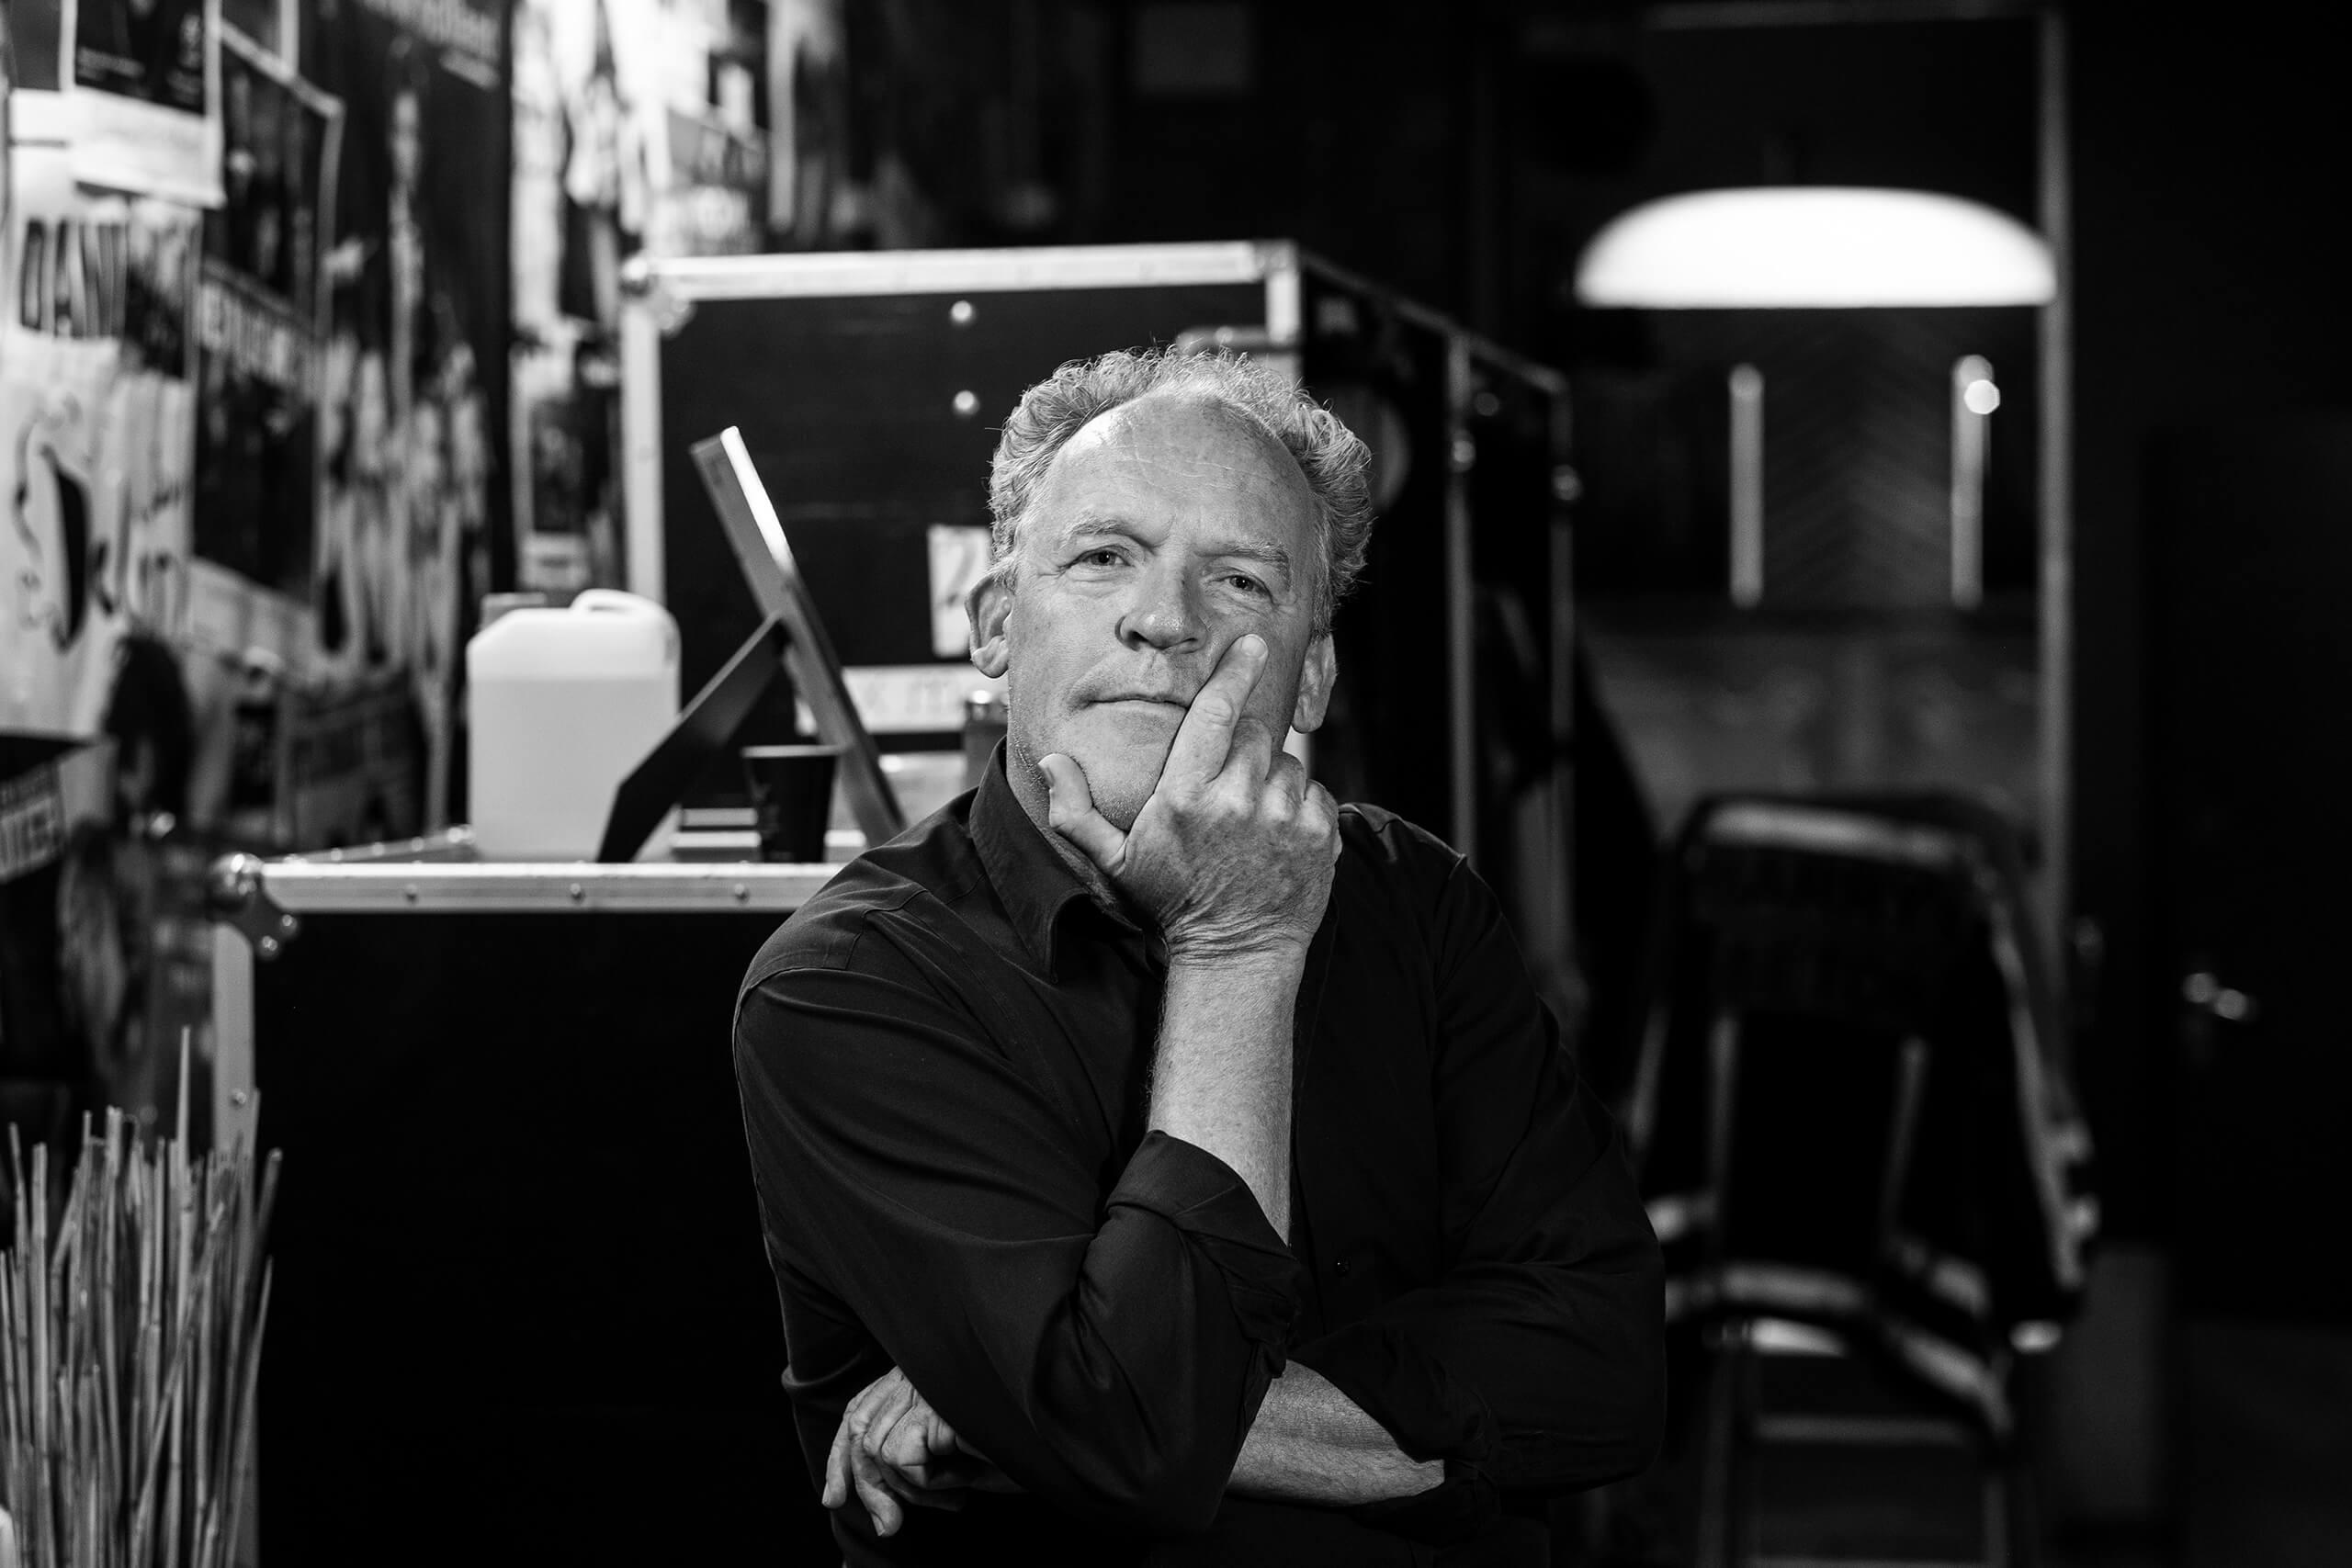 theaterfotografie Bert Visscher cabaretier theater zwartwit artiestenfoto artiest